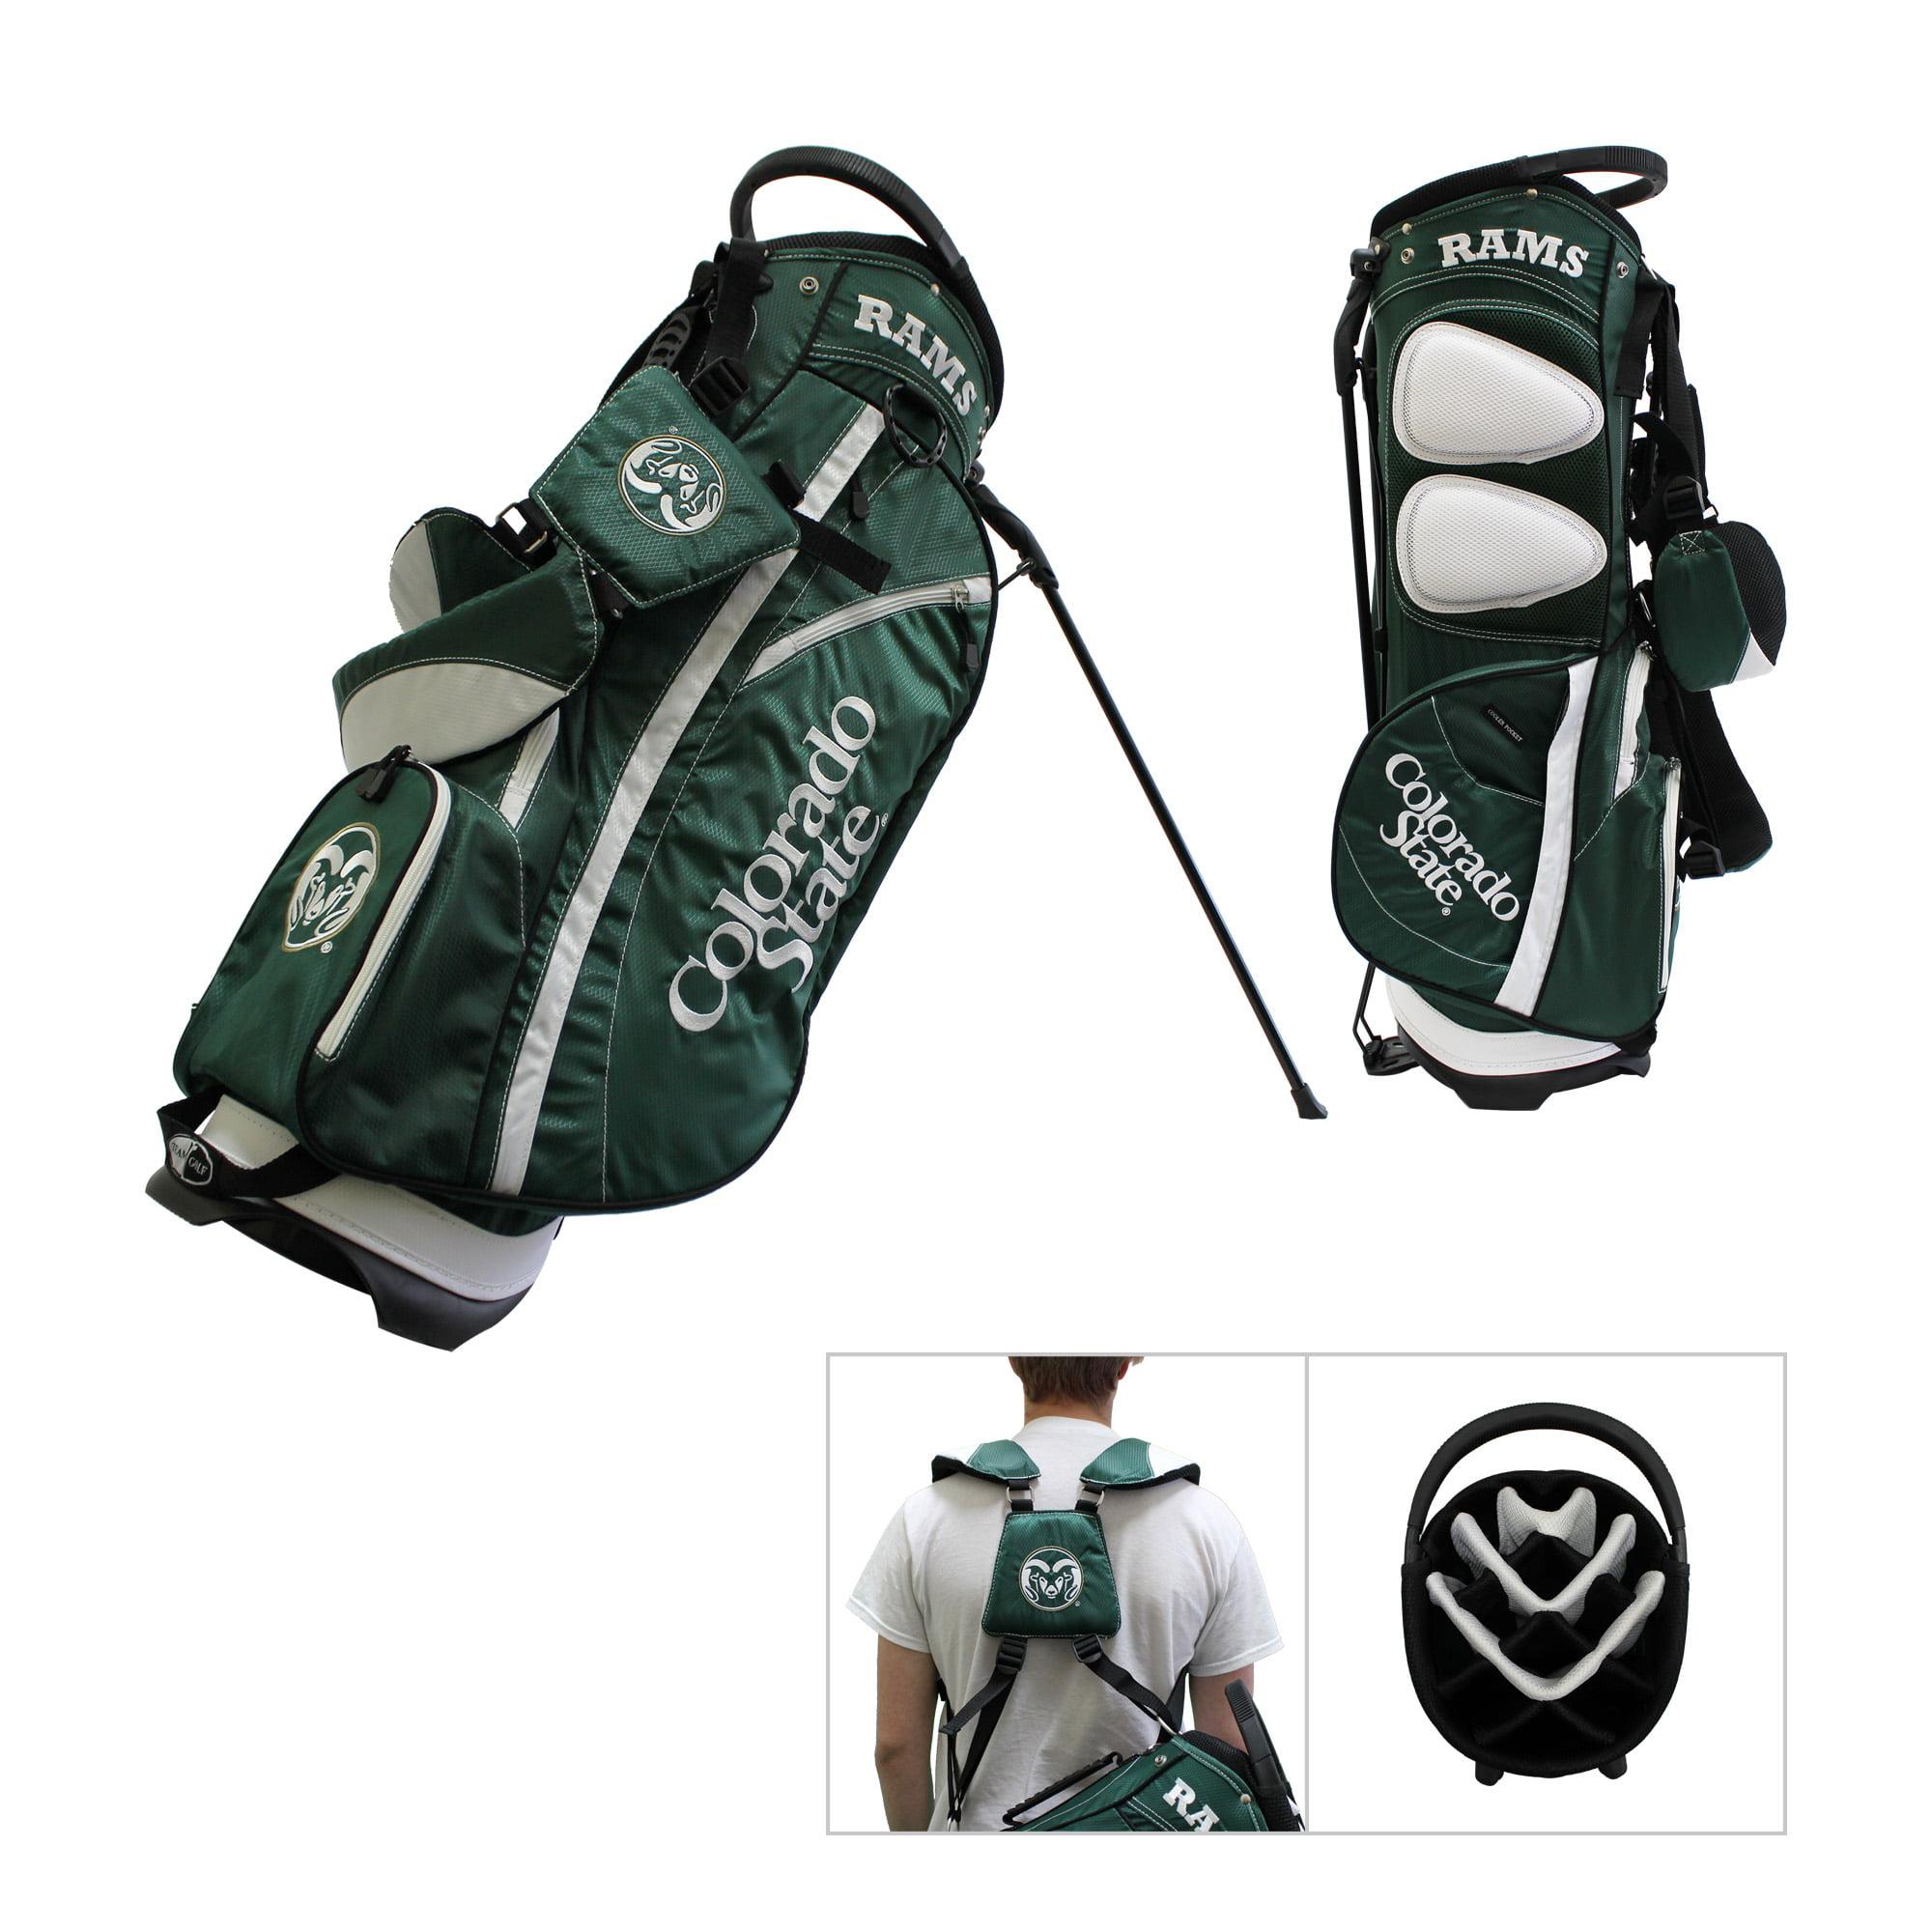 Colorado State Rams Team Golf Fairway Lightweight 14-Way Top Golf Club Stand Bag by